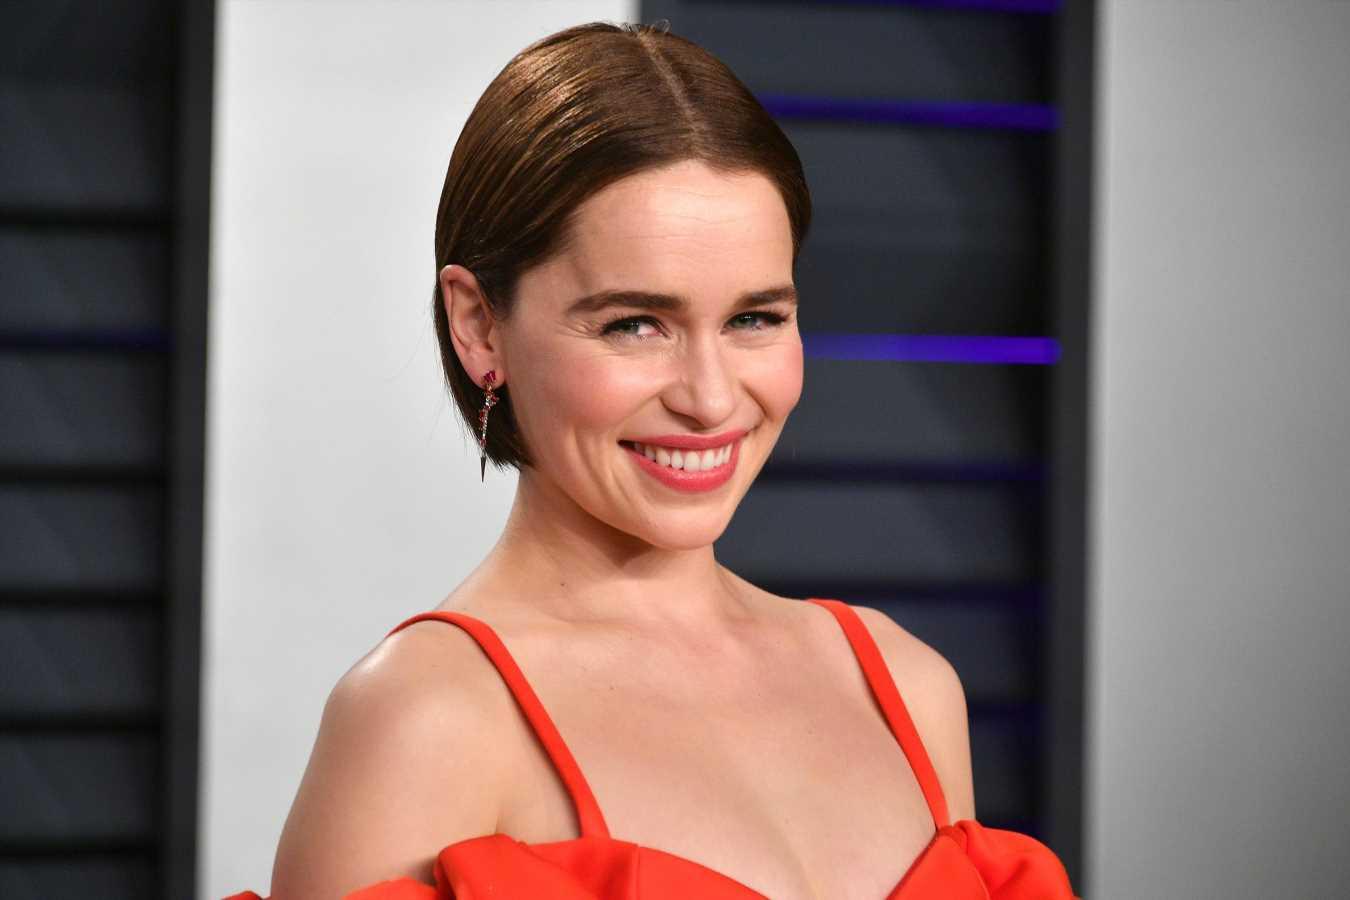 Game of Thrones star Emilia Clarke responds to Reddit fundraiser